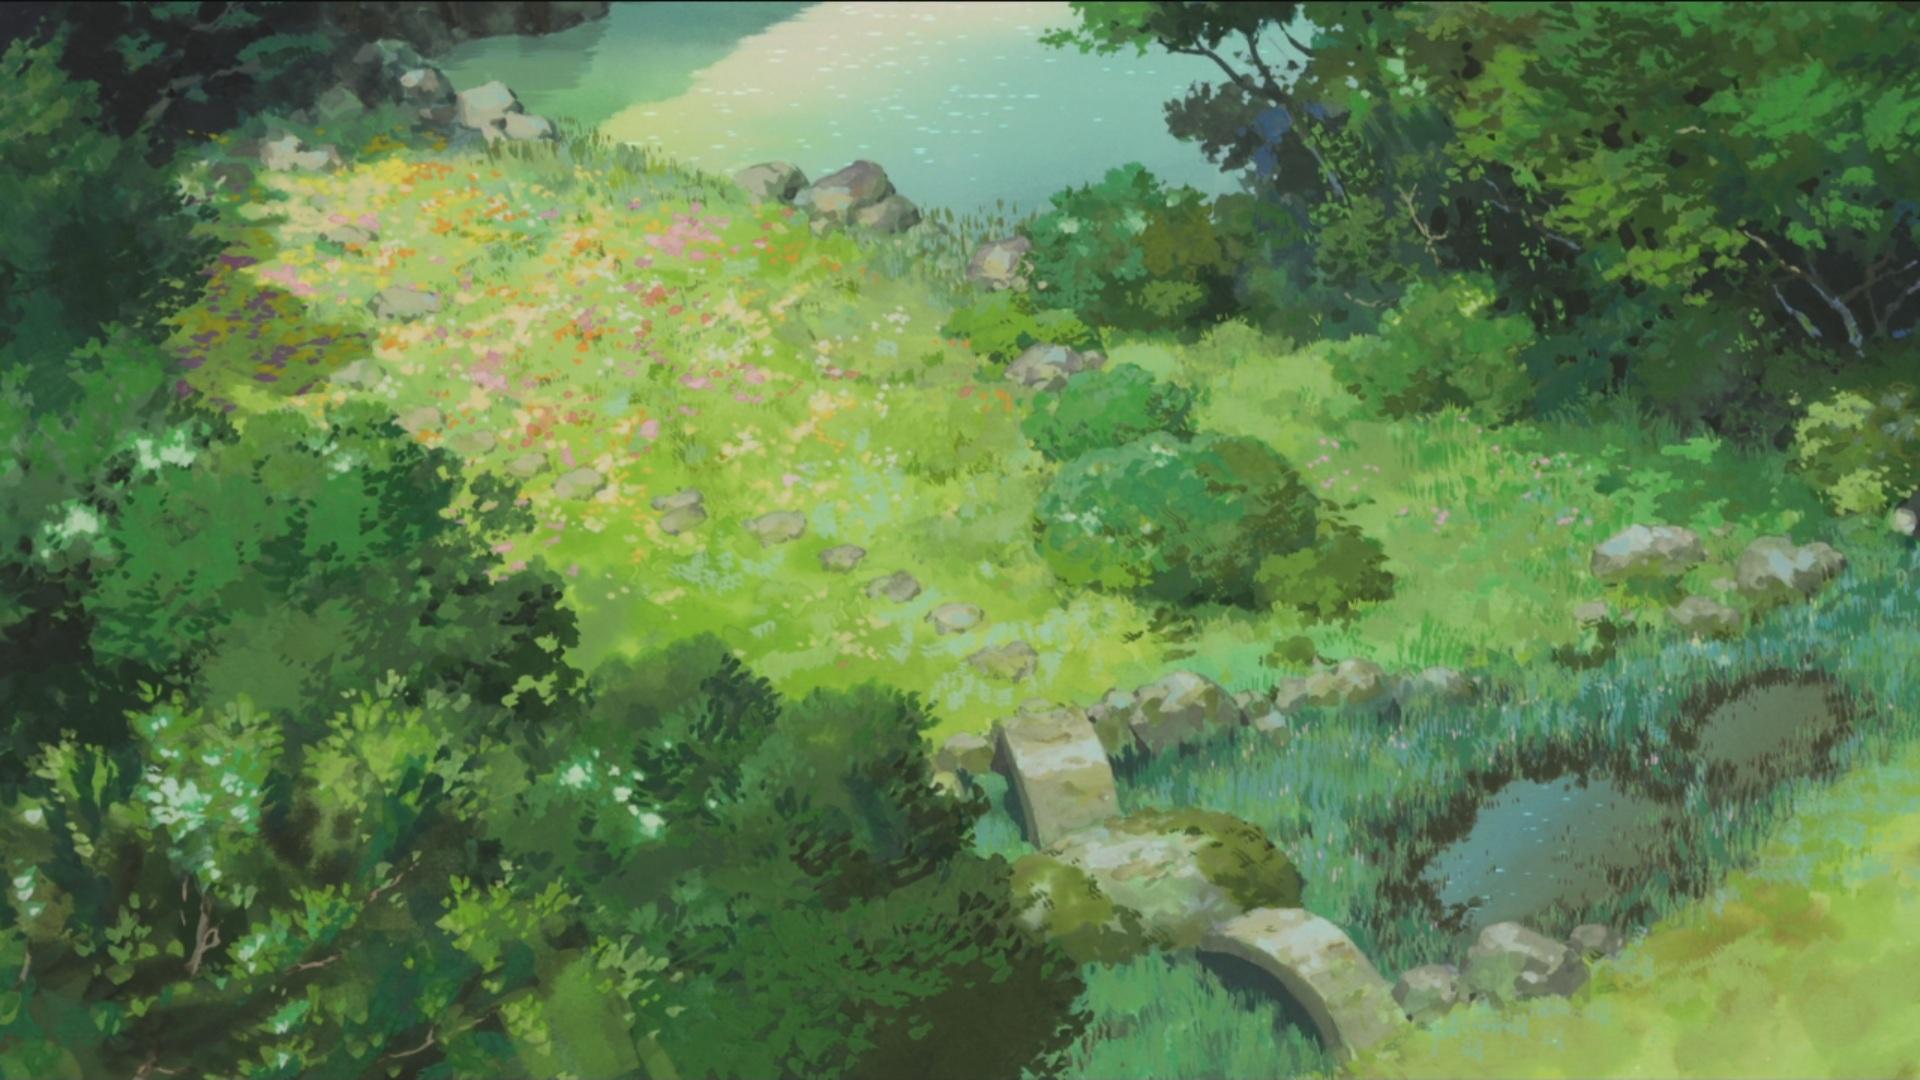 no Arrietty The Secret World of Arrietty wallpaper background 1920x1080